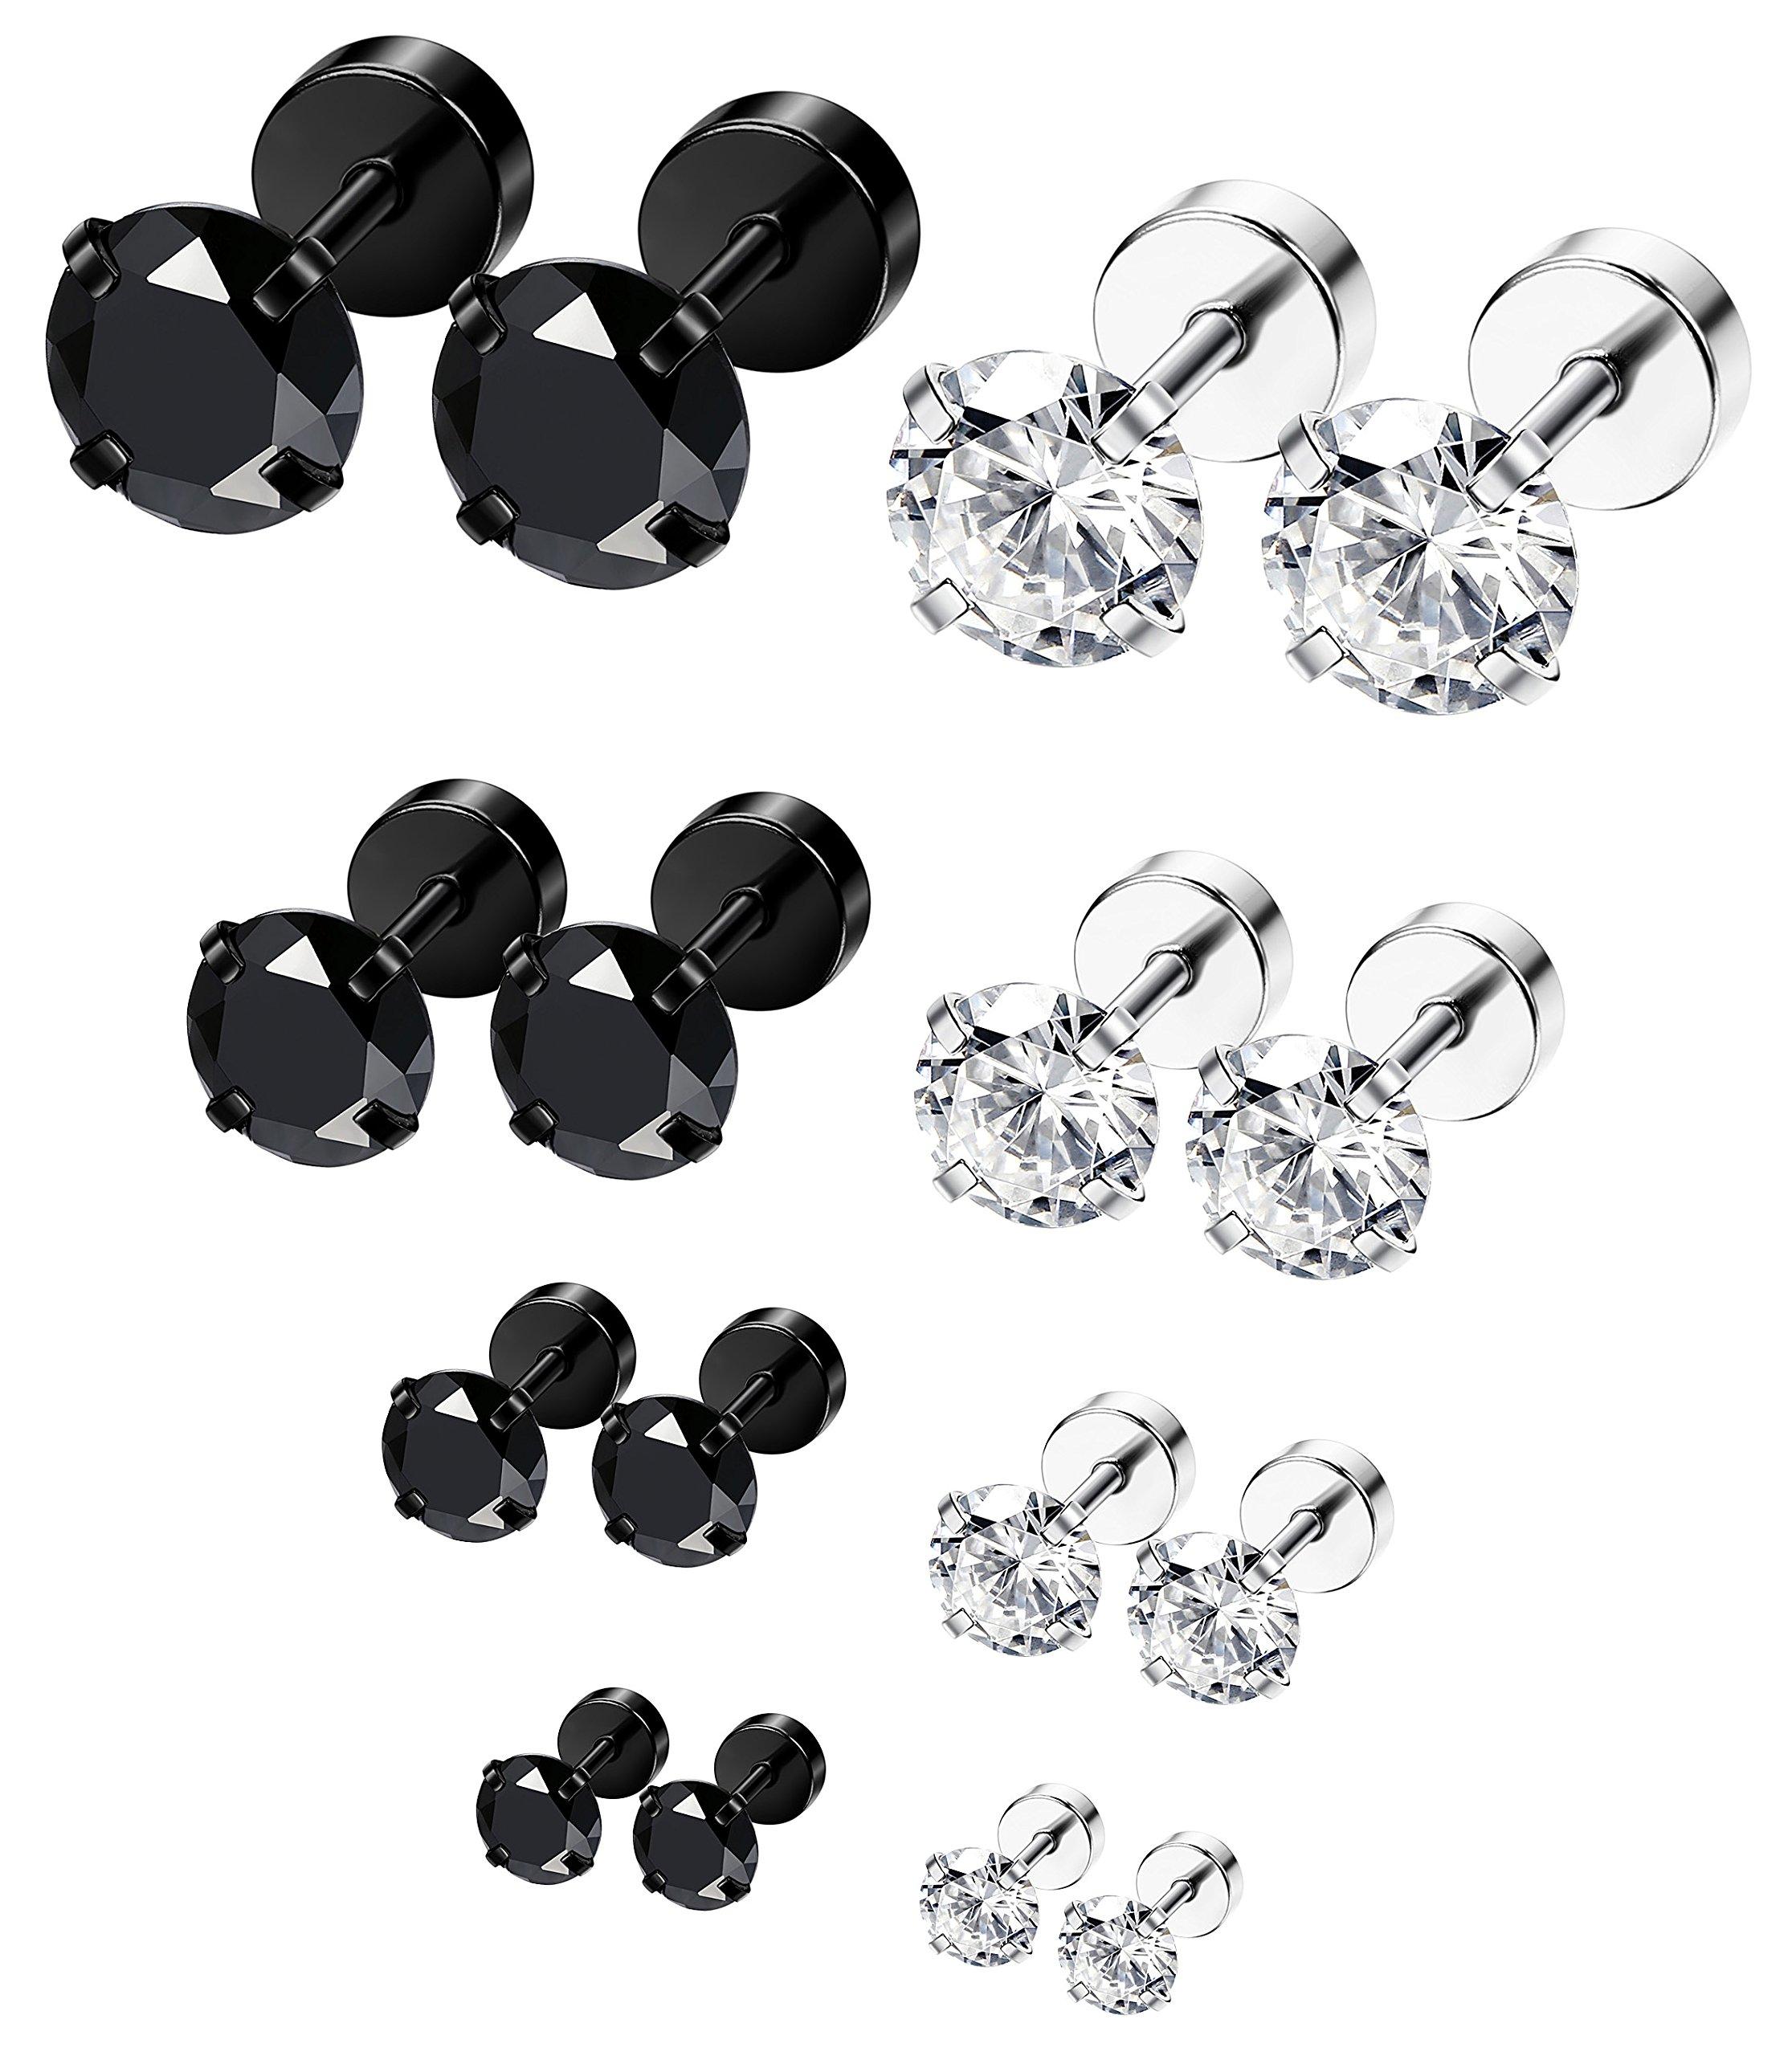 ORAZIO 8 Pairs 18G Stainless Steel Ear Stud Piercing Barbell Studs Earrings Round Cubic Zirconia Inlaid